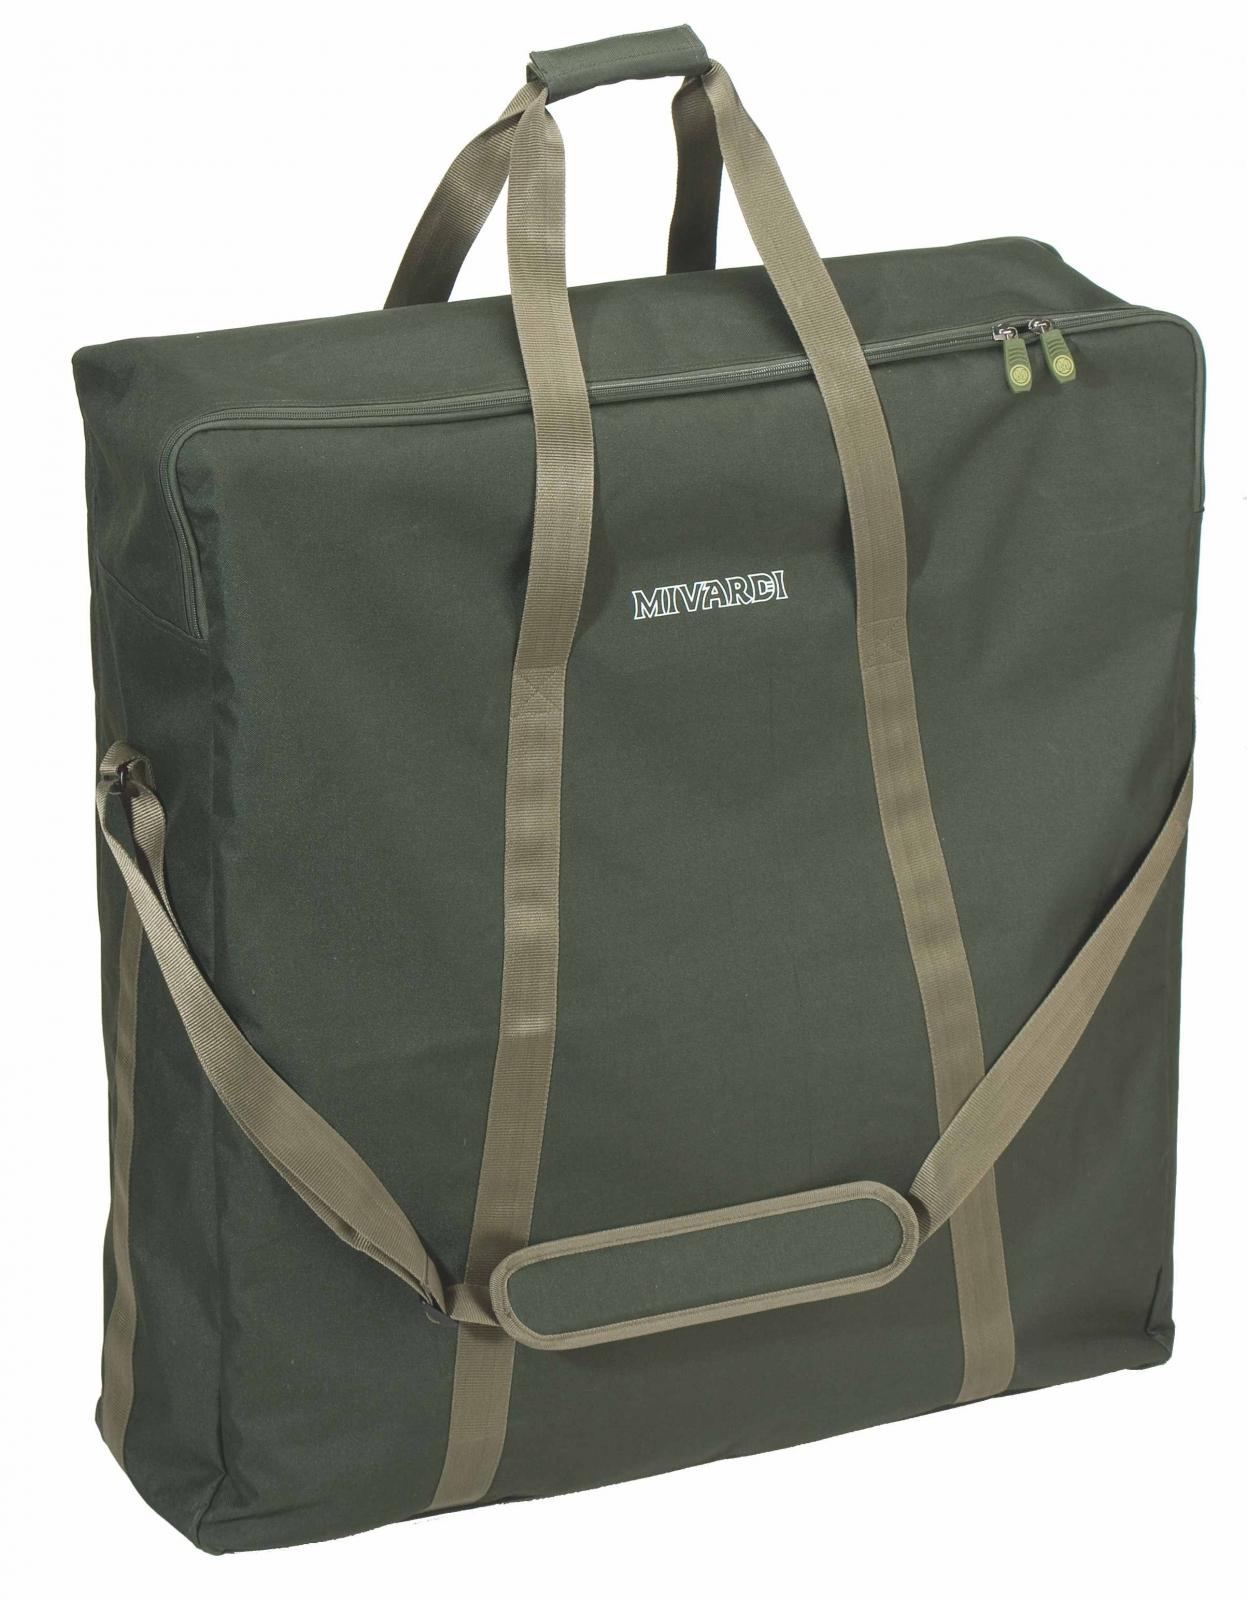 Transportní taška na lehátko Mivardi CamoCODE Air8 / New Dynasty Air8